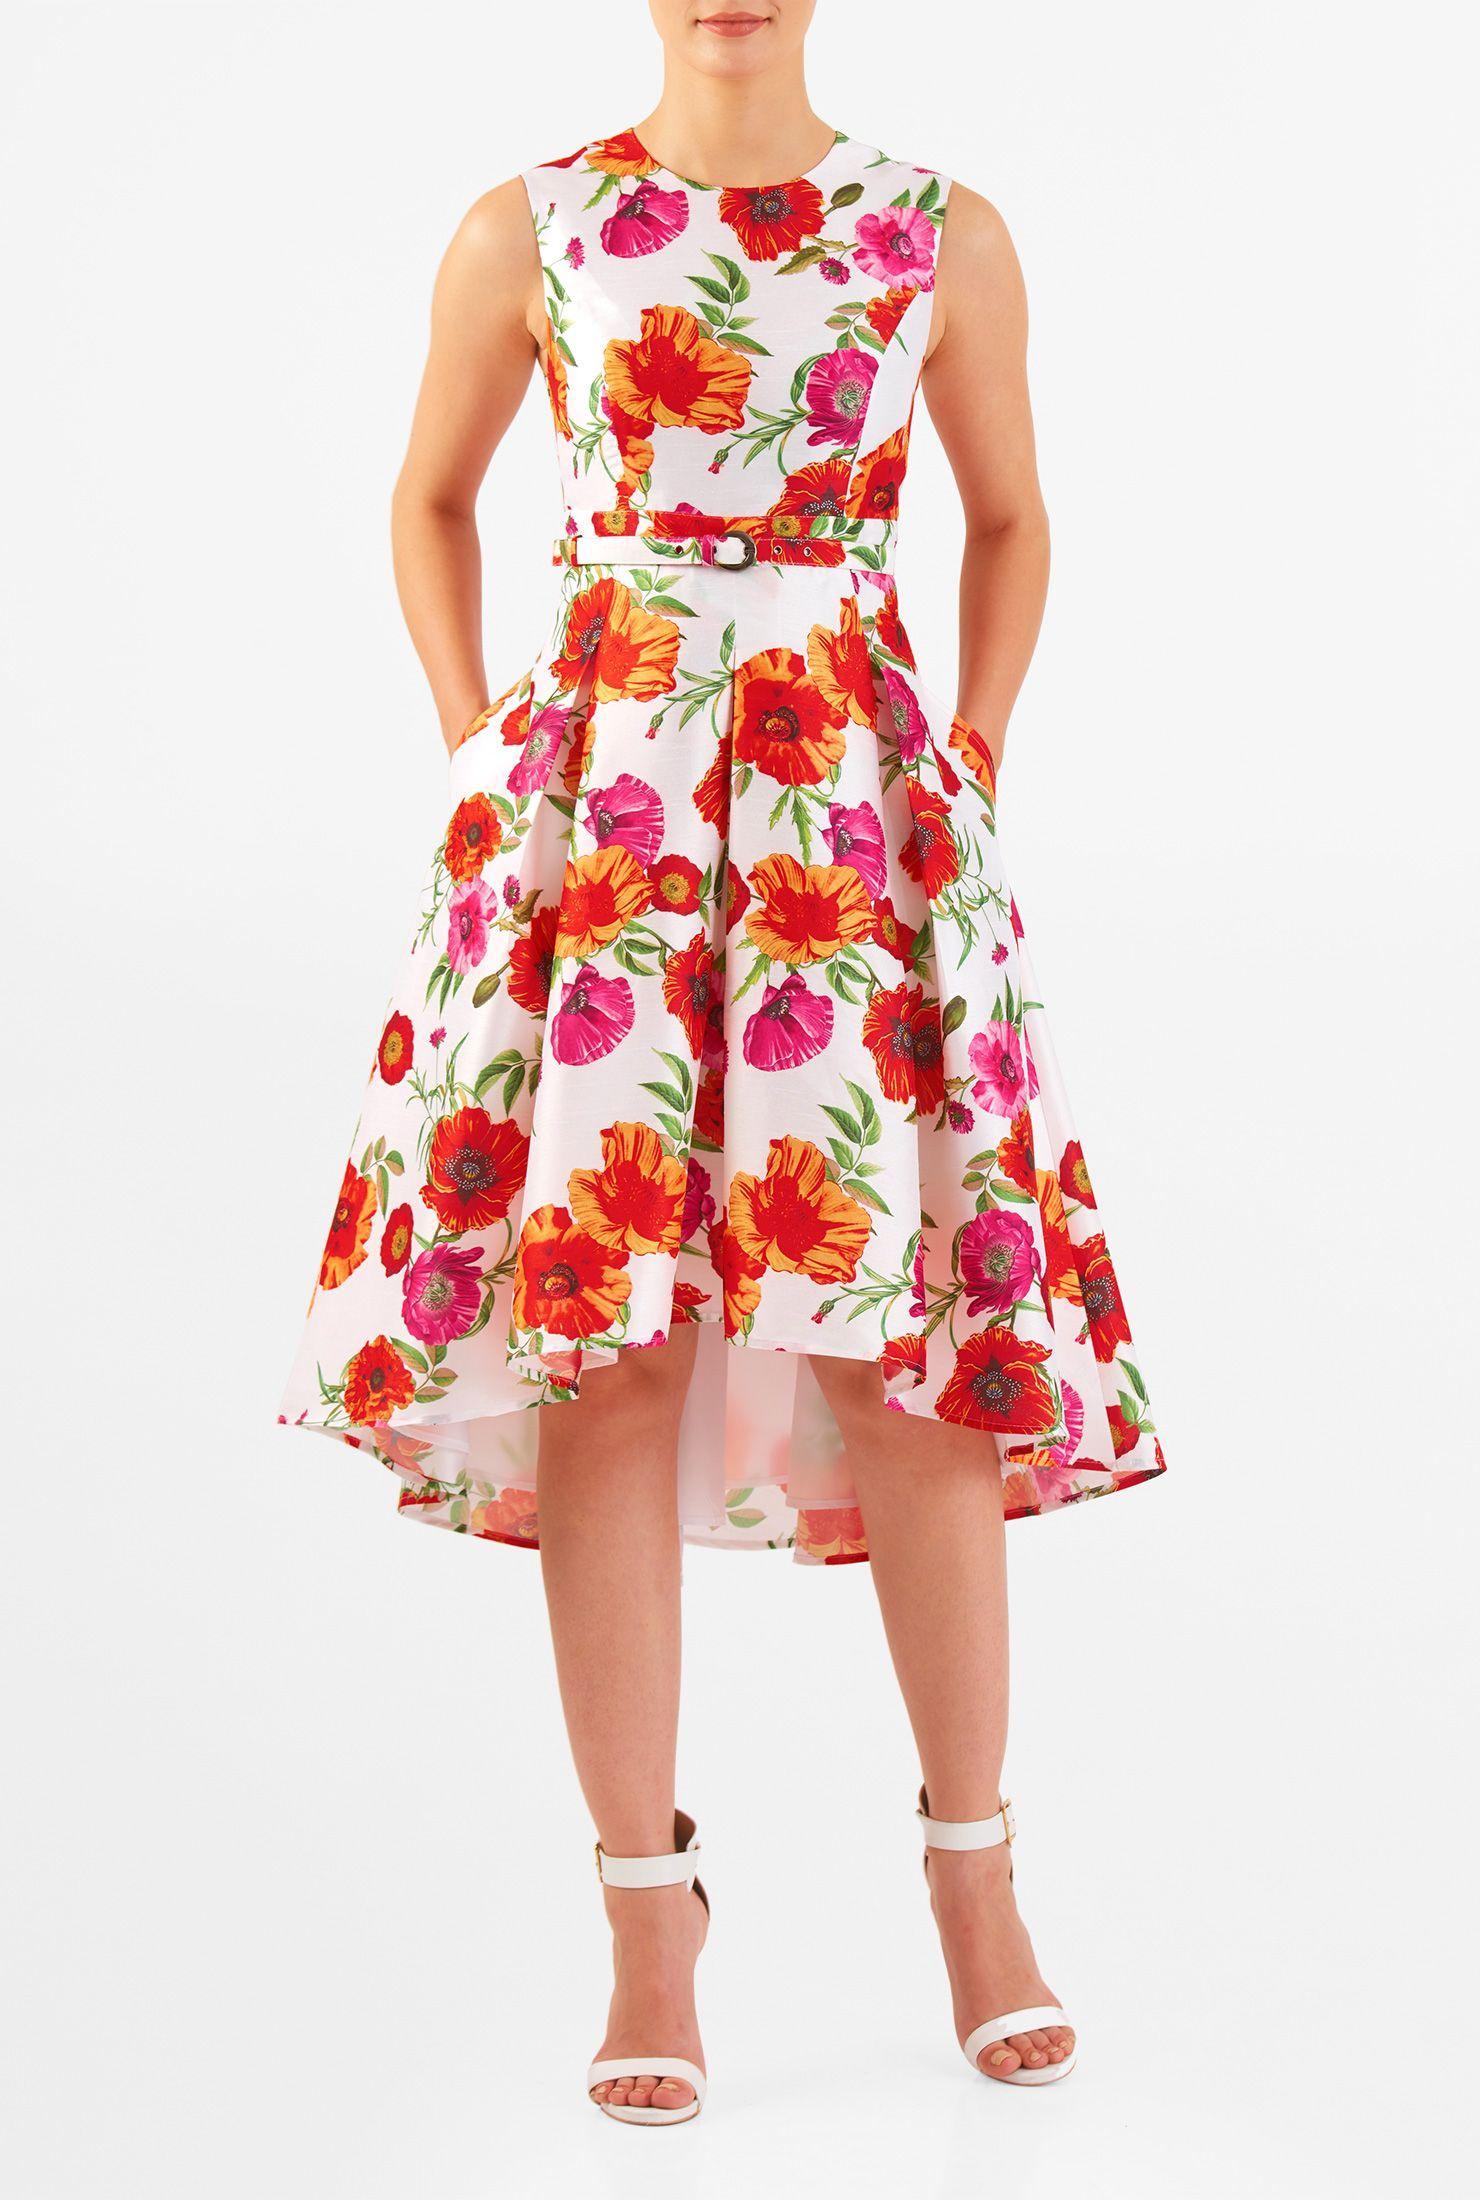 High Low Hem Floral Print Dupioni Belted Dress Floral Dresses Uk Floral Print Midi Dress Occasion Maxi Dresses